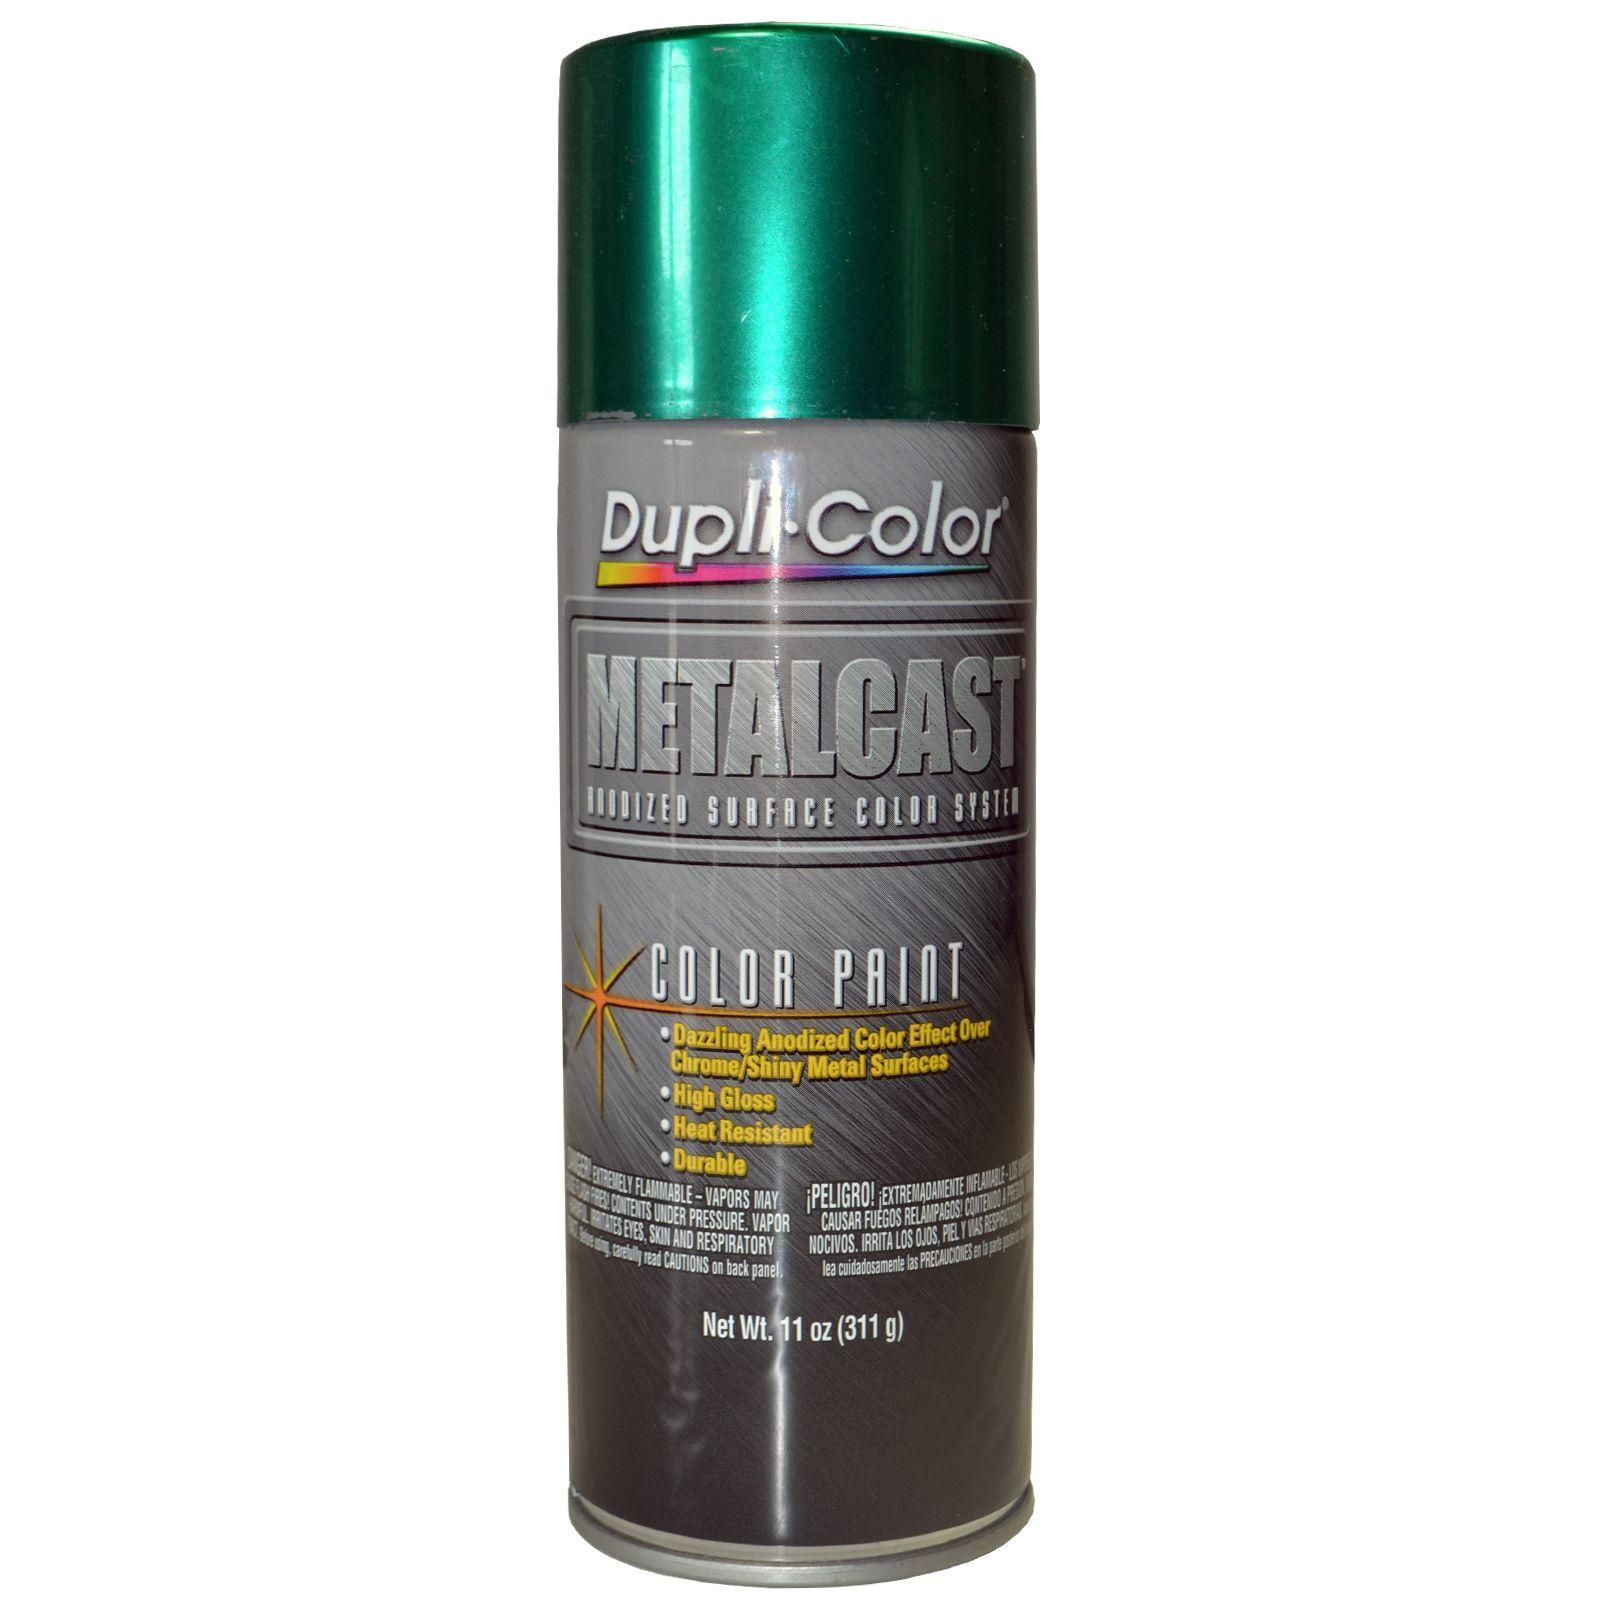 Dupli Color Mc201 Green Metalcast Anodized Spray Aerosol Paint 11 Oz Can Ebay